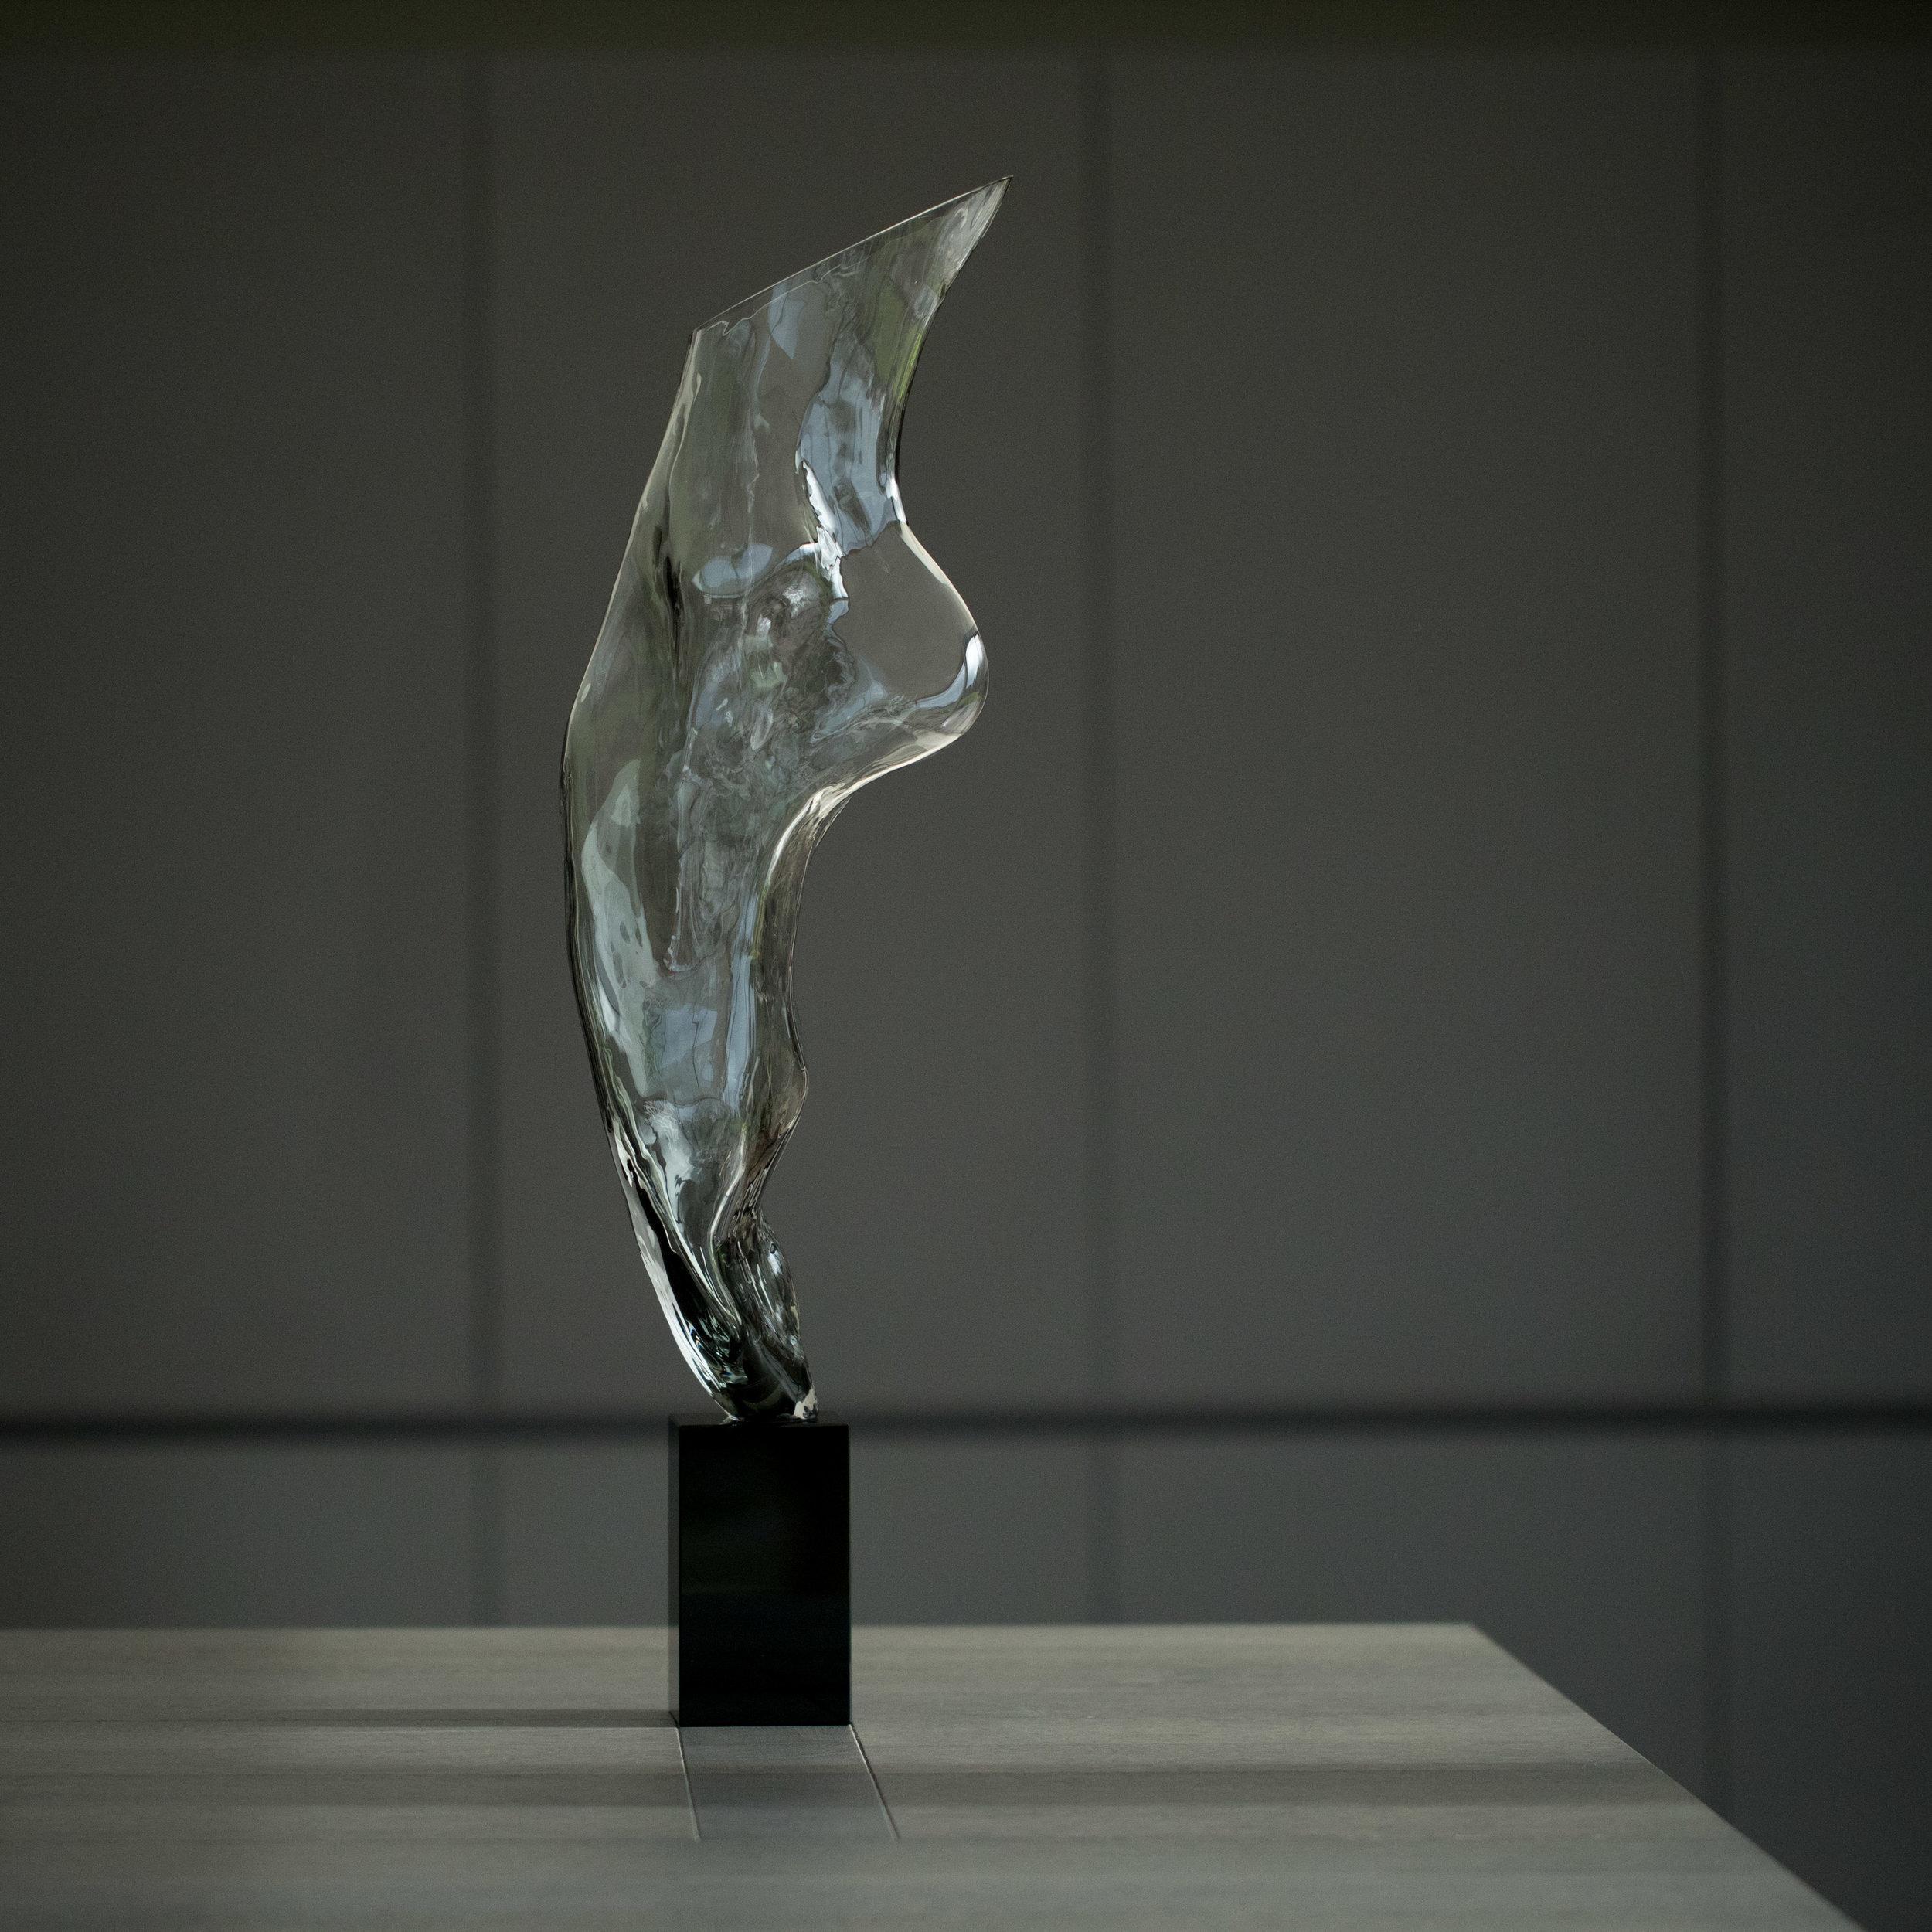 Artist: Kate Viner  Title: En Pointe  Size: 72 x 20 x 15 cm  Medium: Glass  Price: £1950